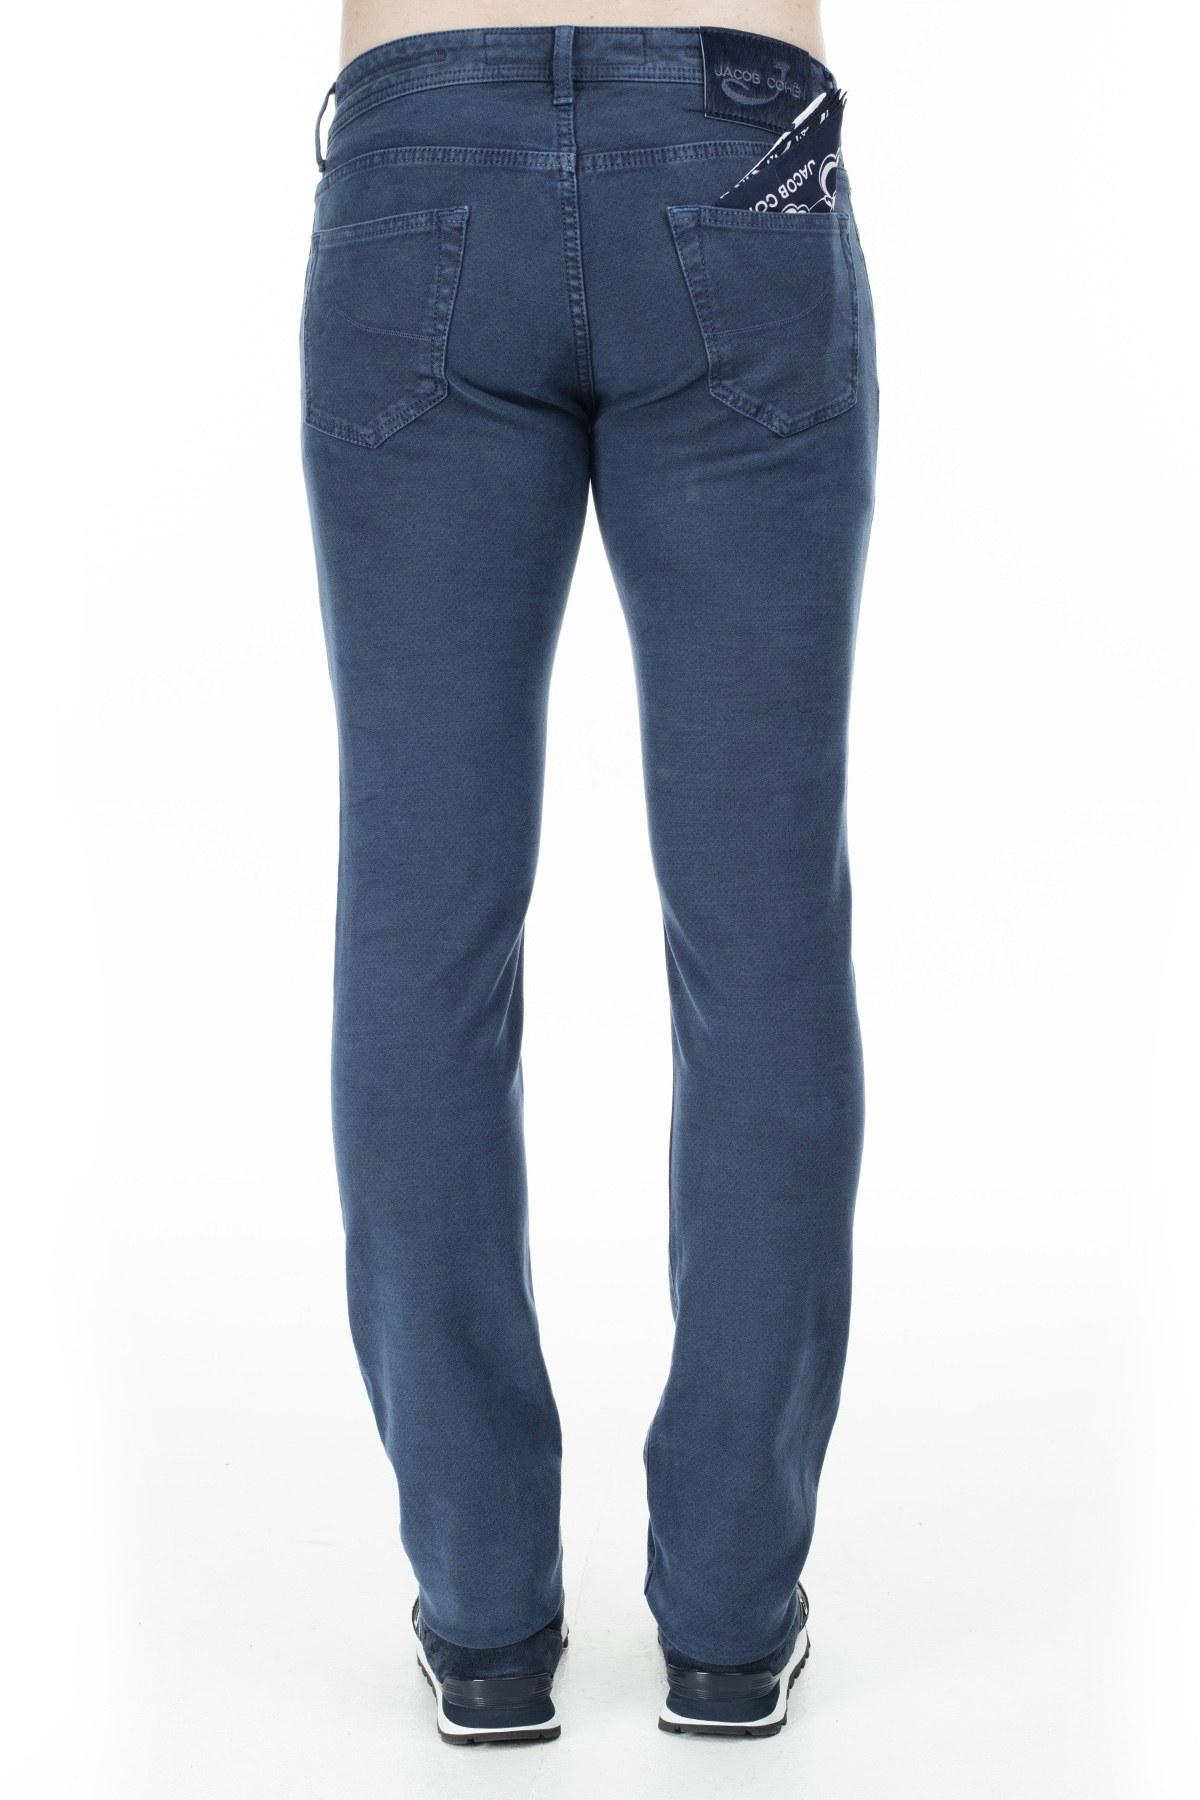 Jacob Cohen Jeans Erkek Pamuklu Pantolon J622 01661V 858 KOYU MAVİ